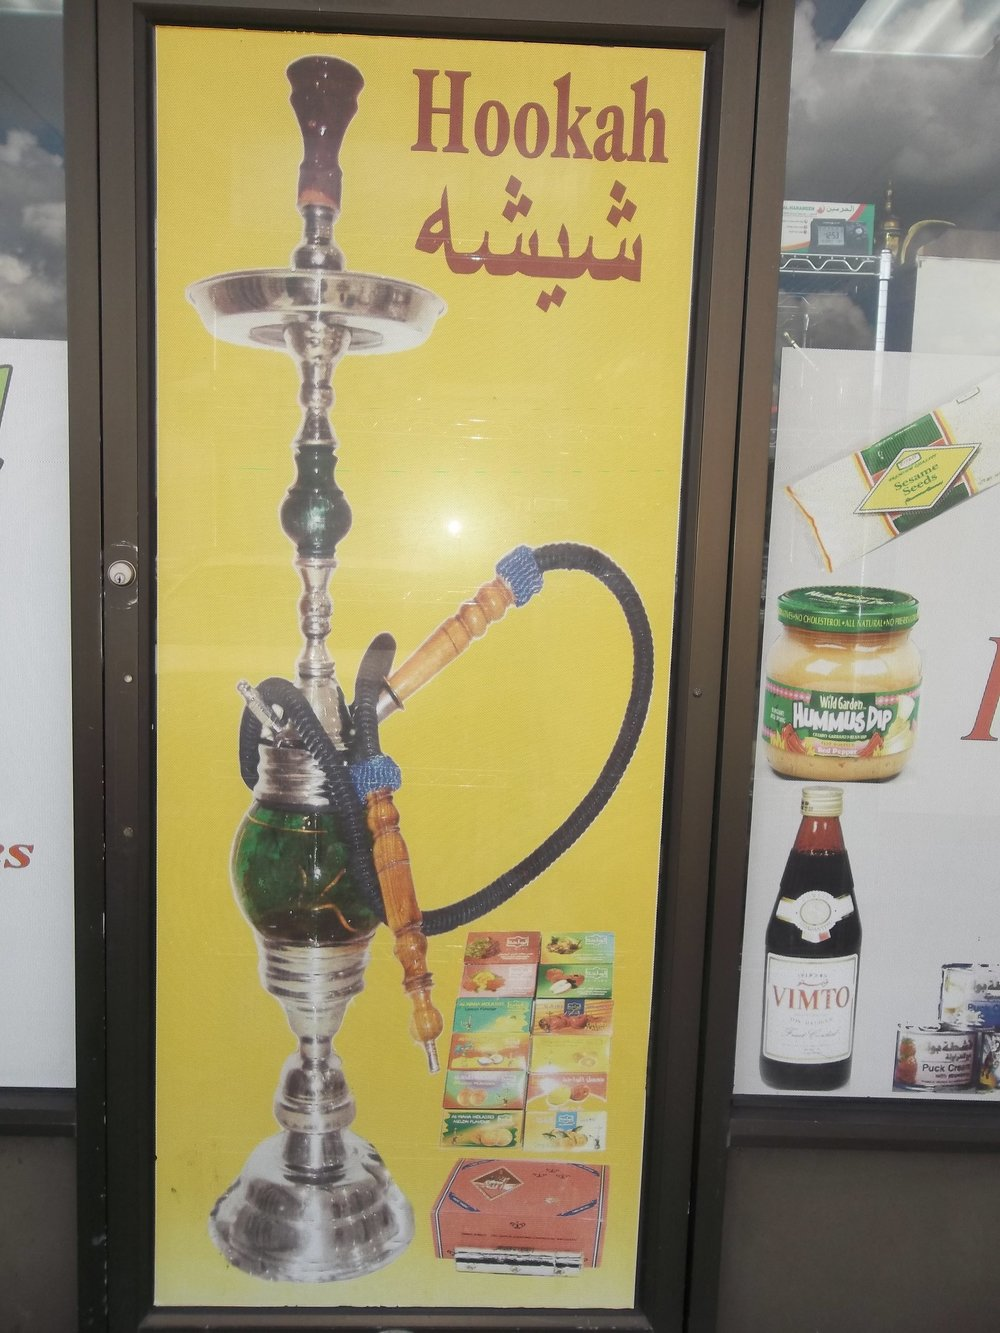 Hookah-Pak-Halal-Mediterranean- Grocery-Store-12259-W-87th-St-Pkwy-Lenexa-KS-66215.JPG